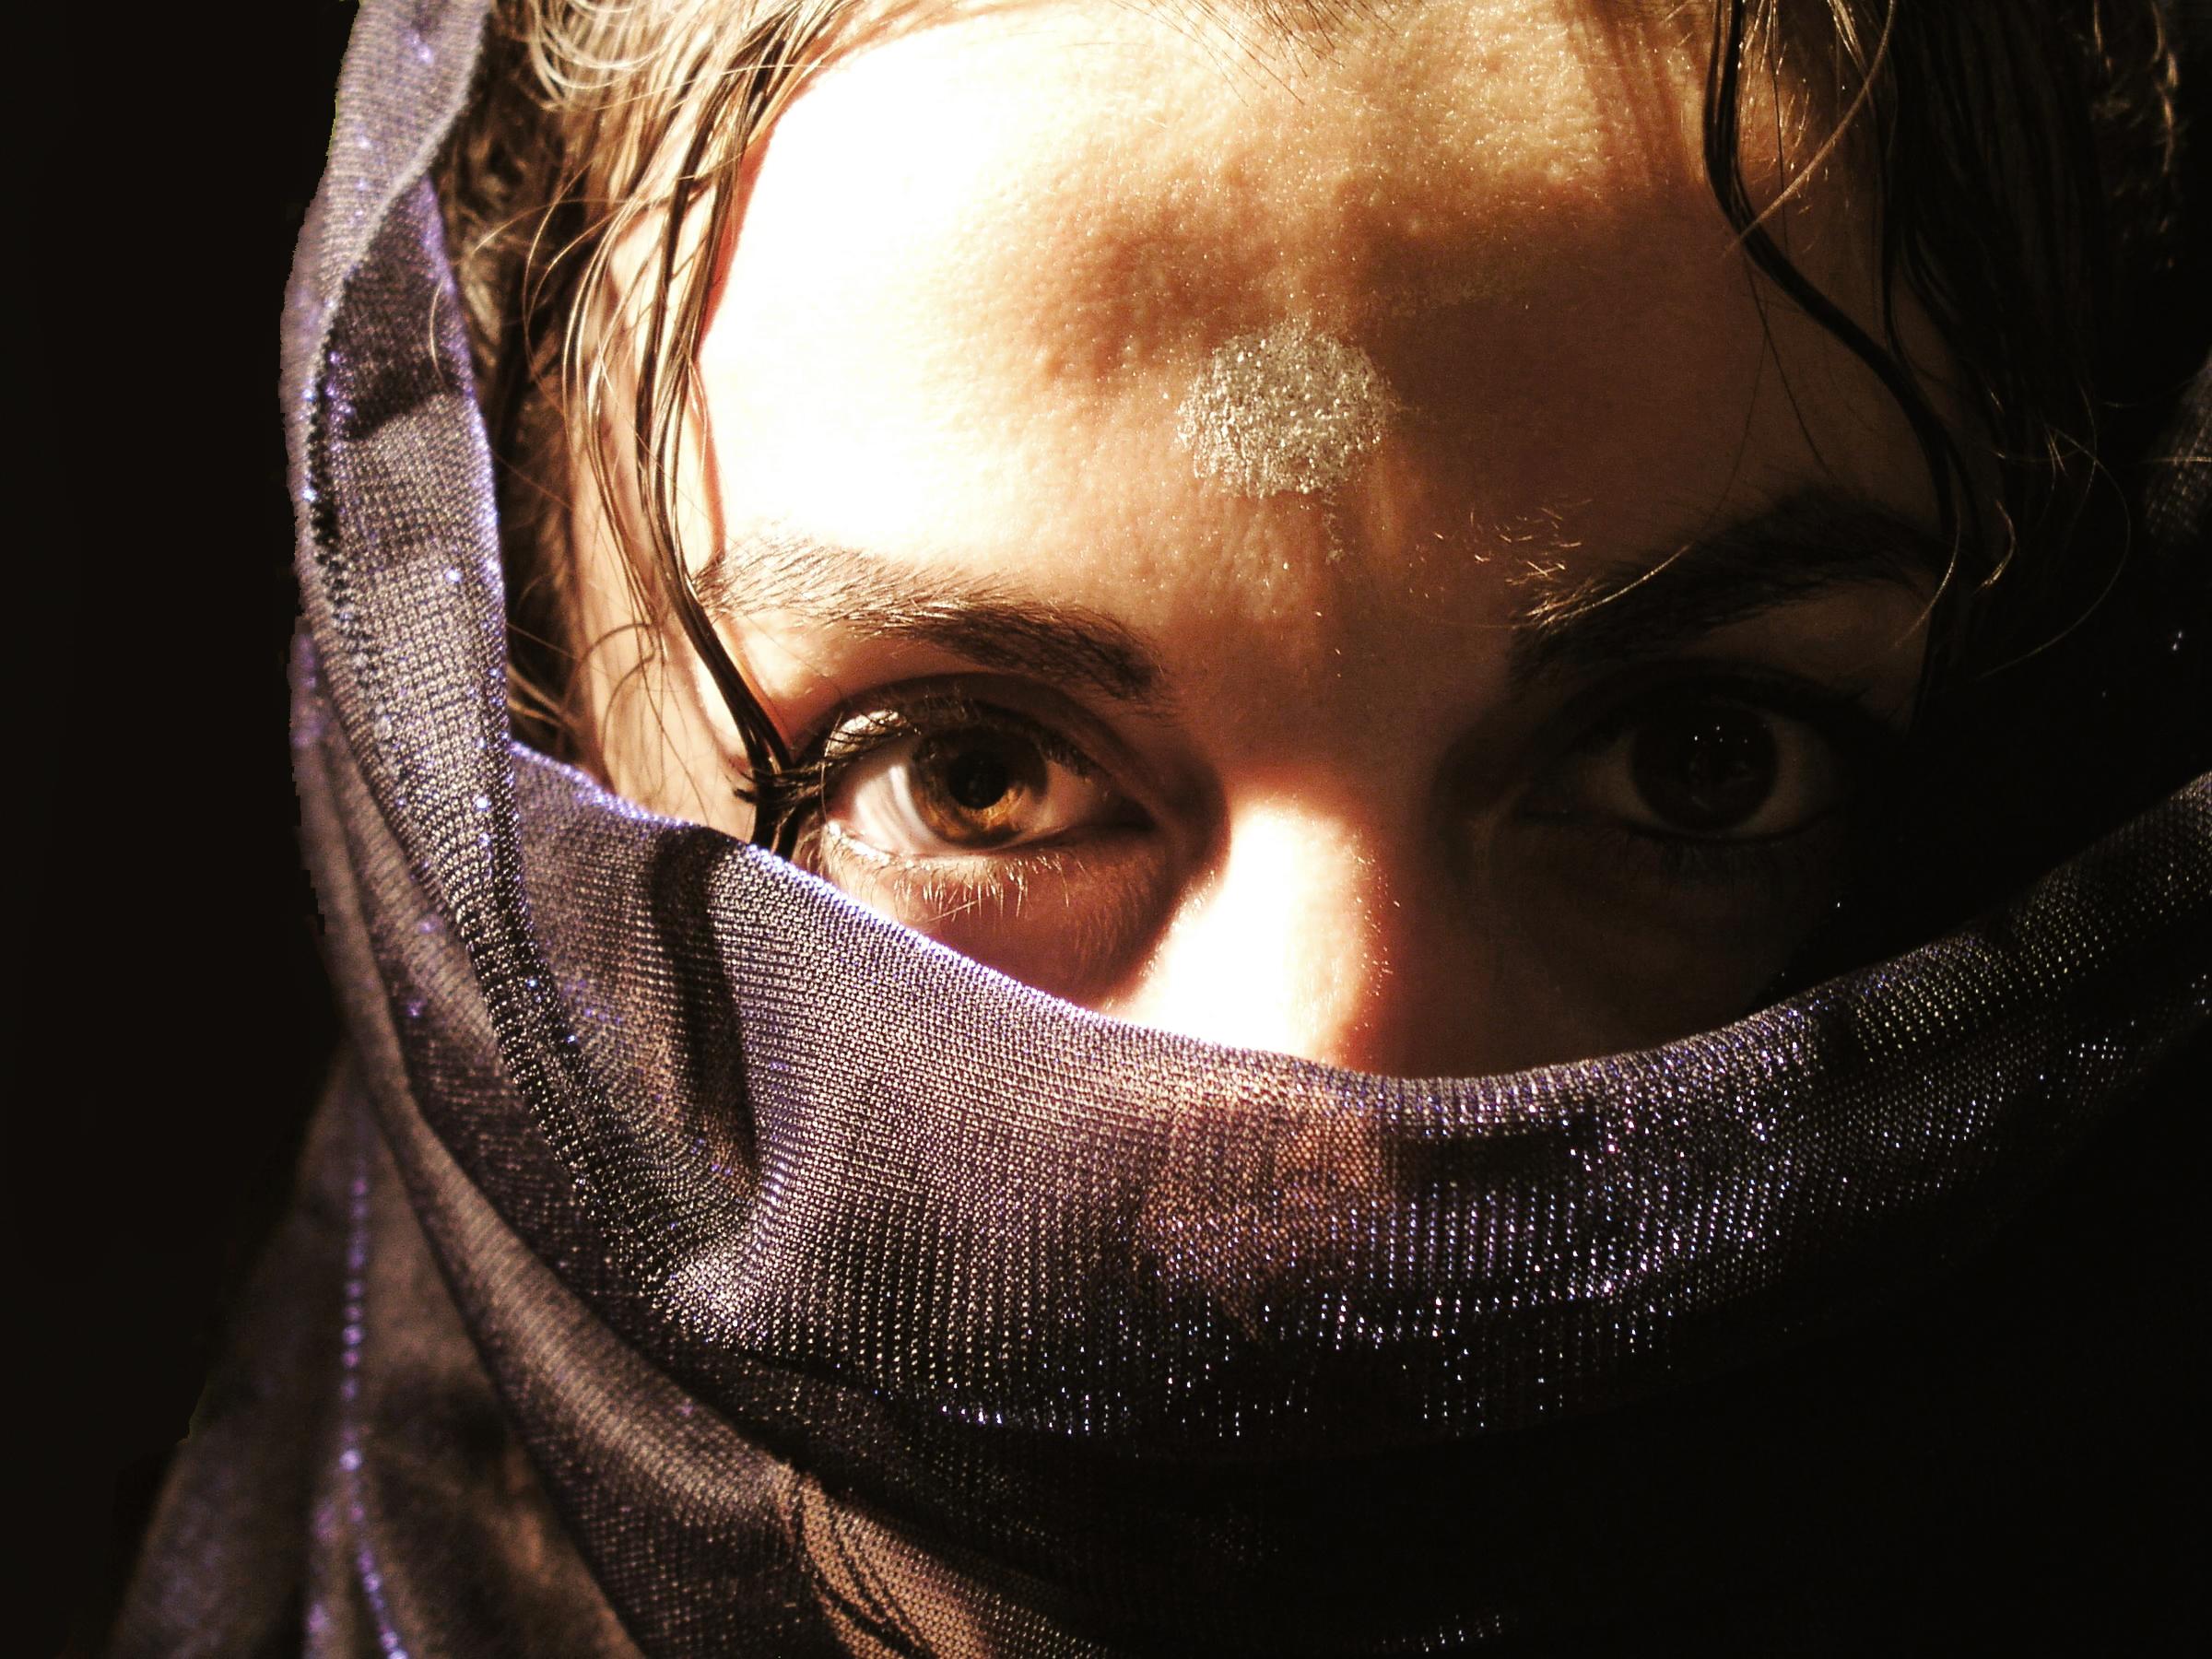 Arab woman with veil photo